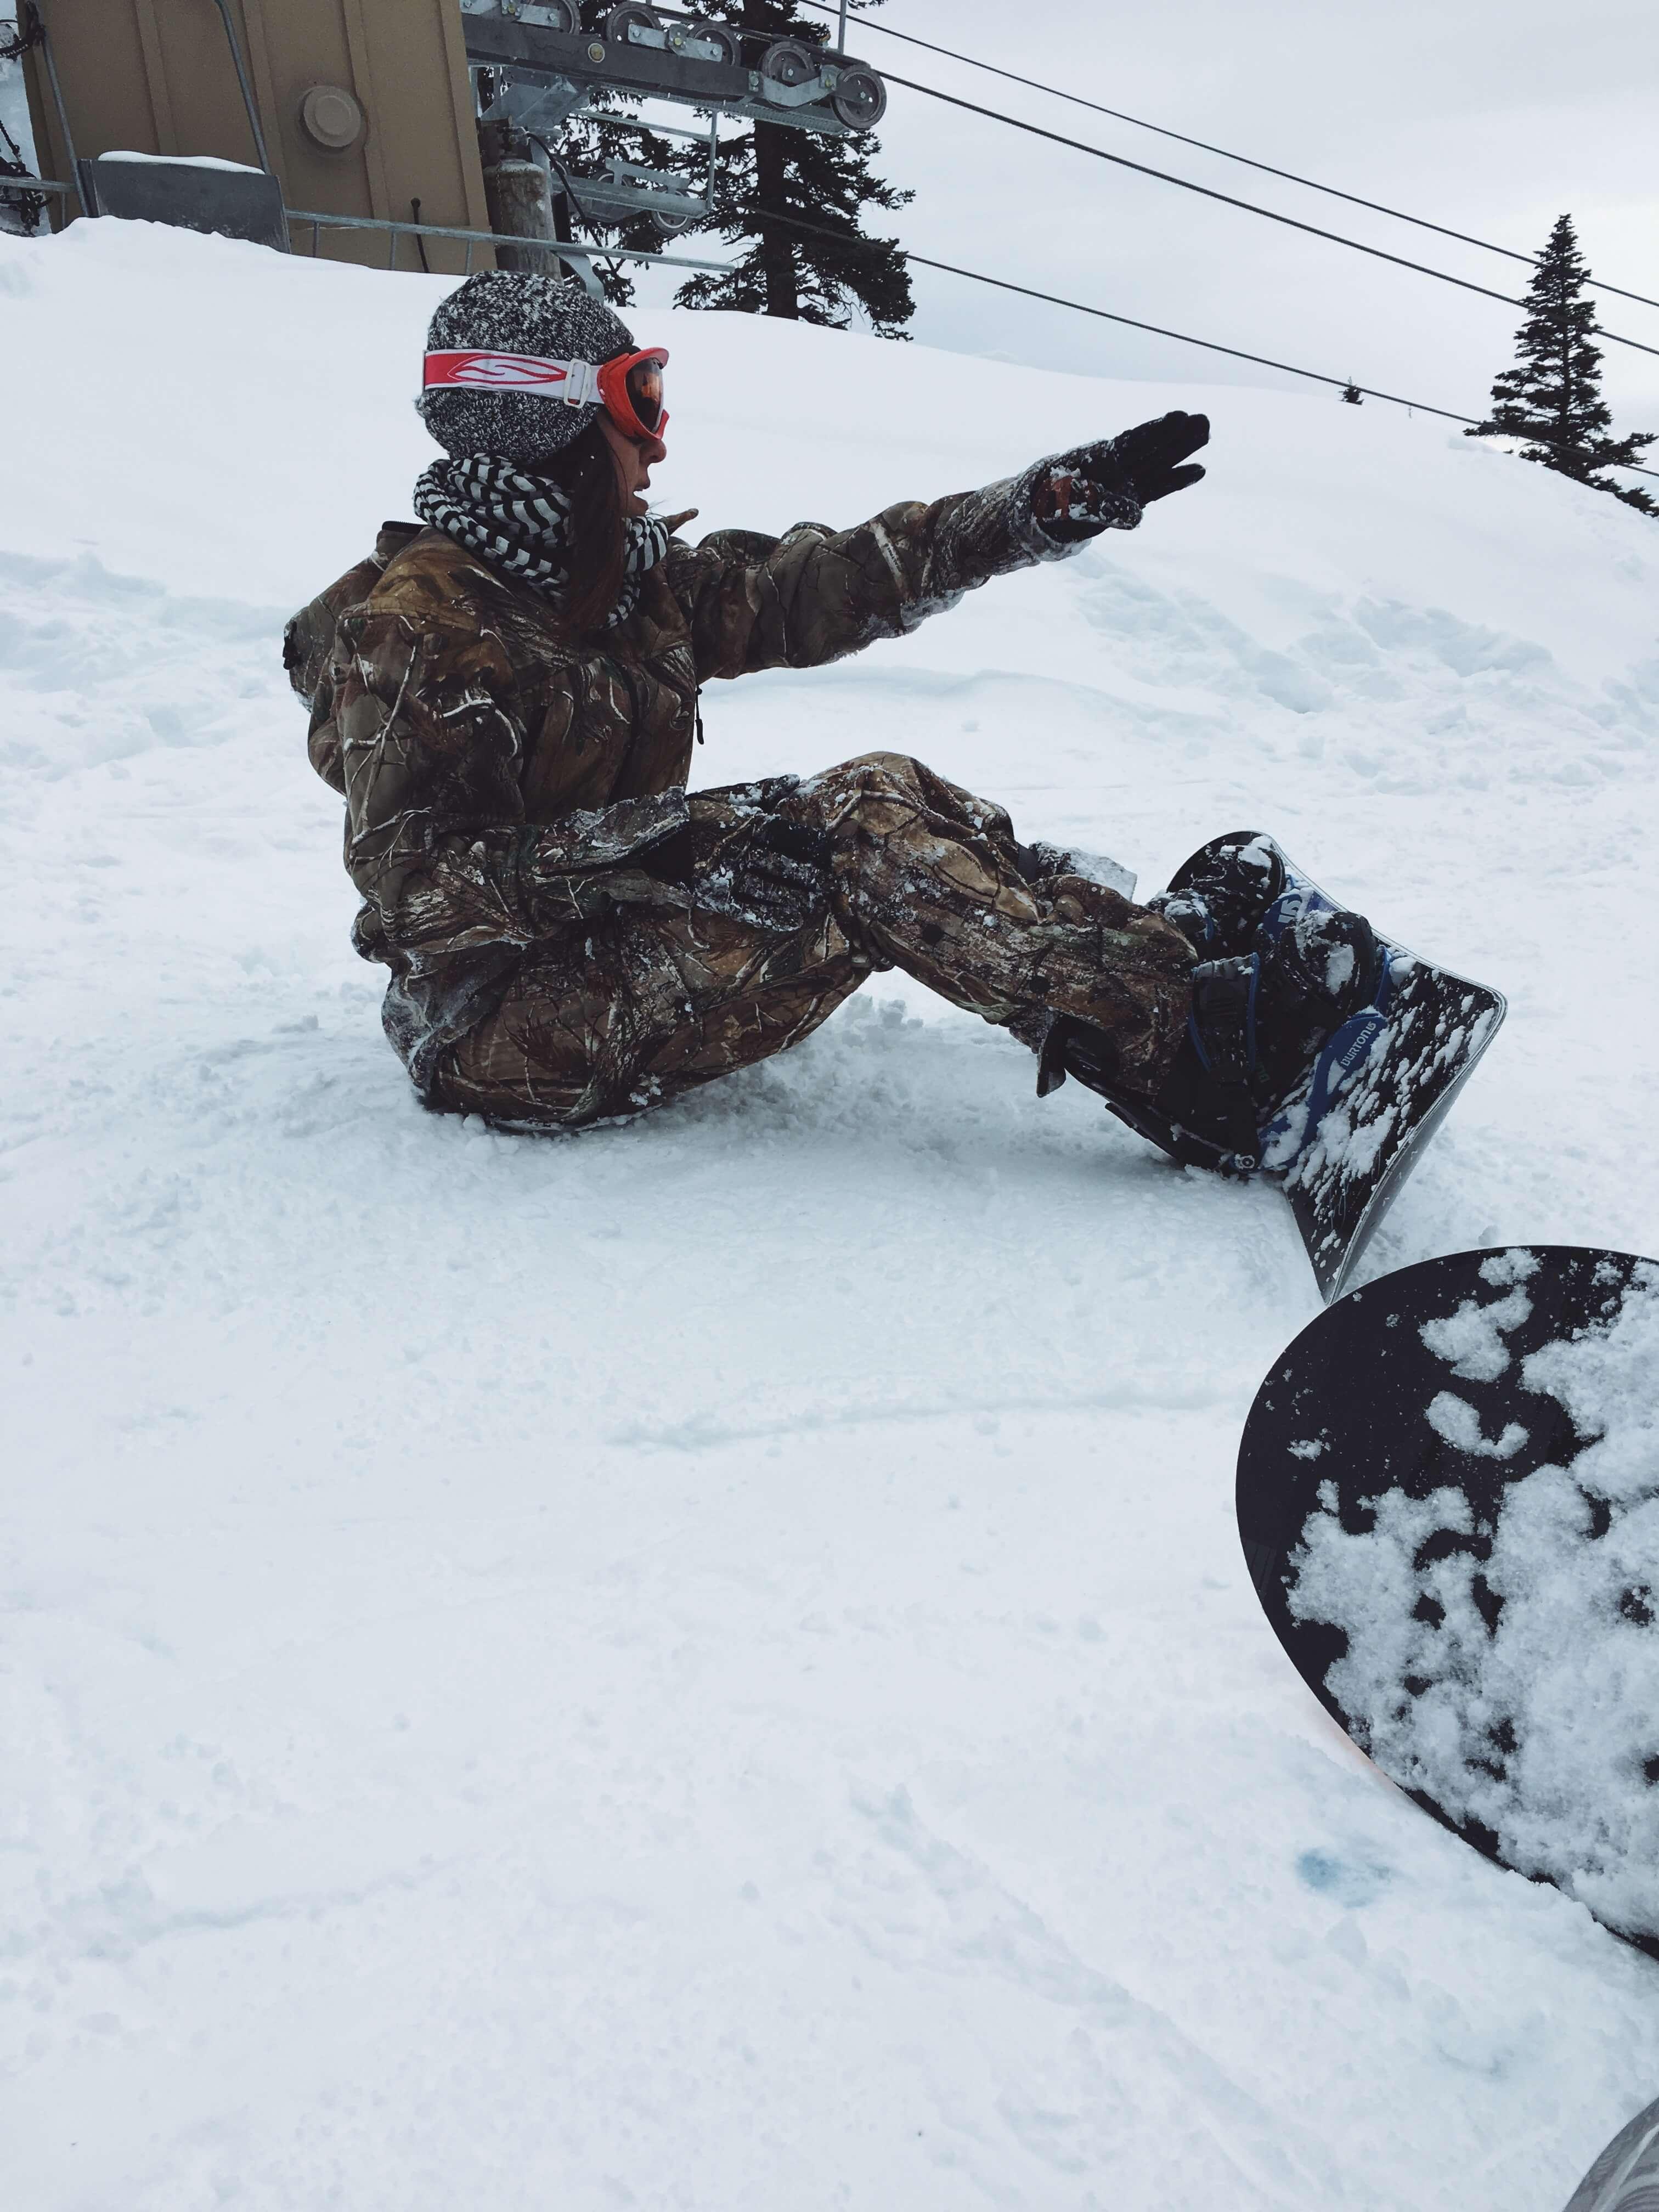 Jenn snowboarding